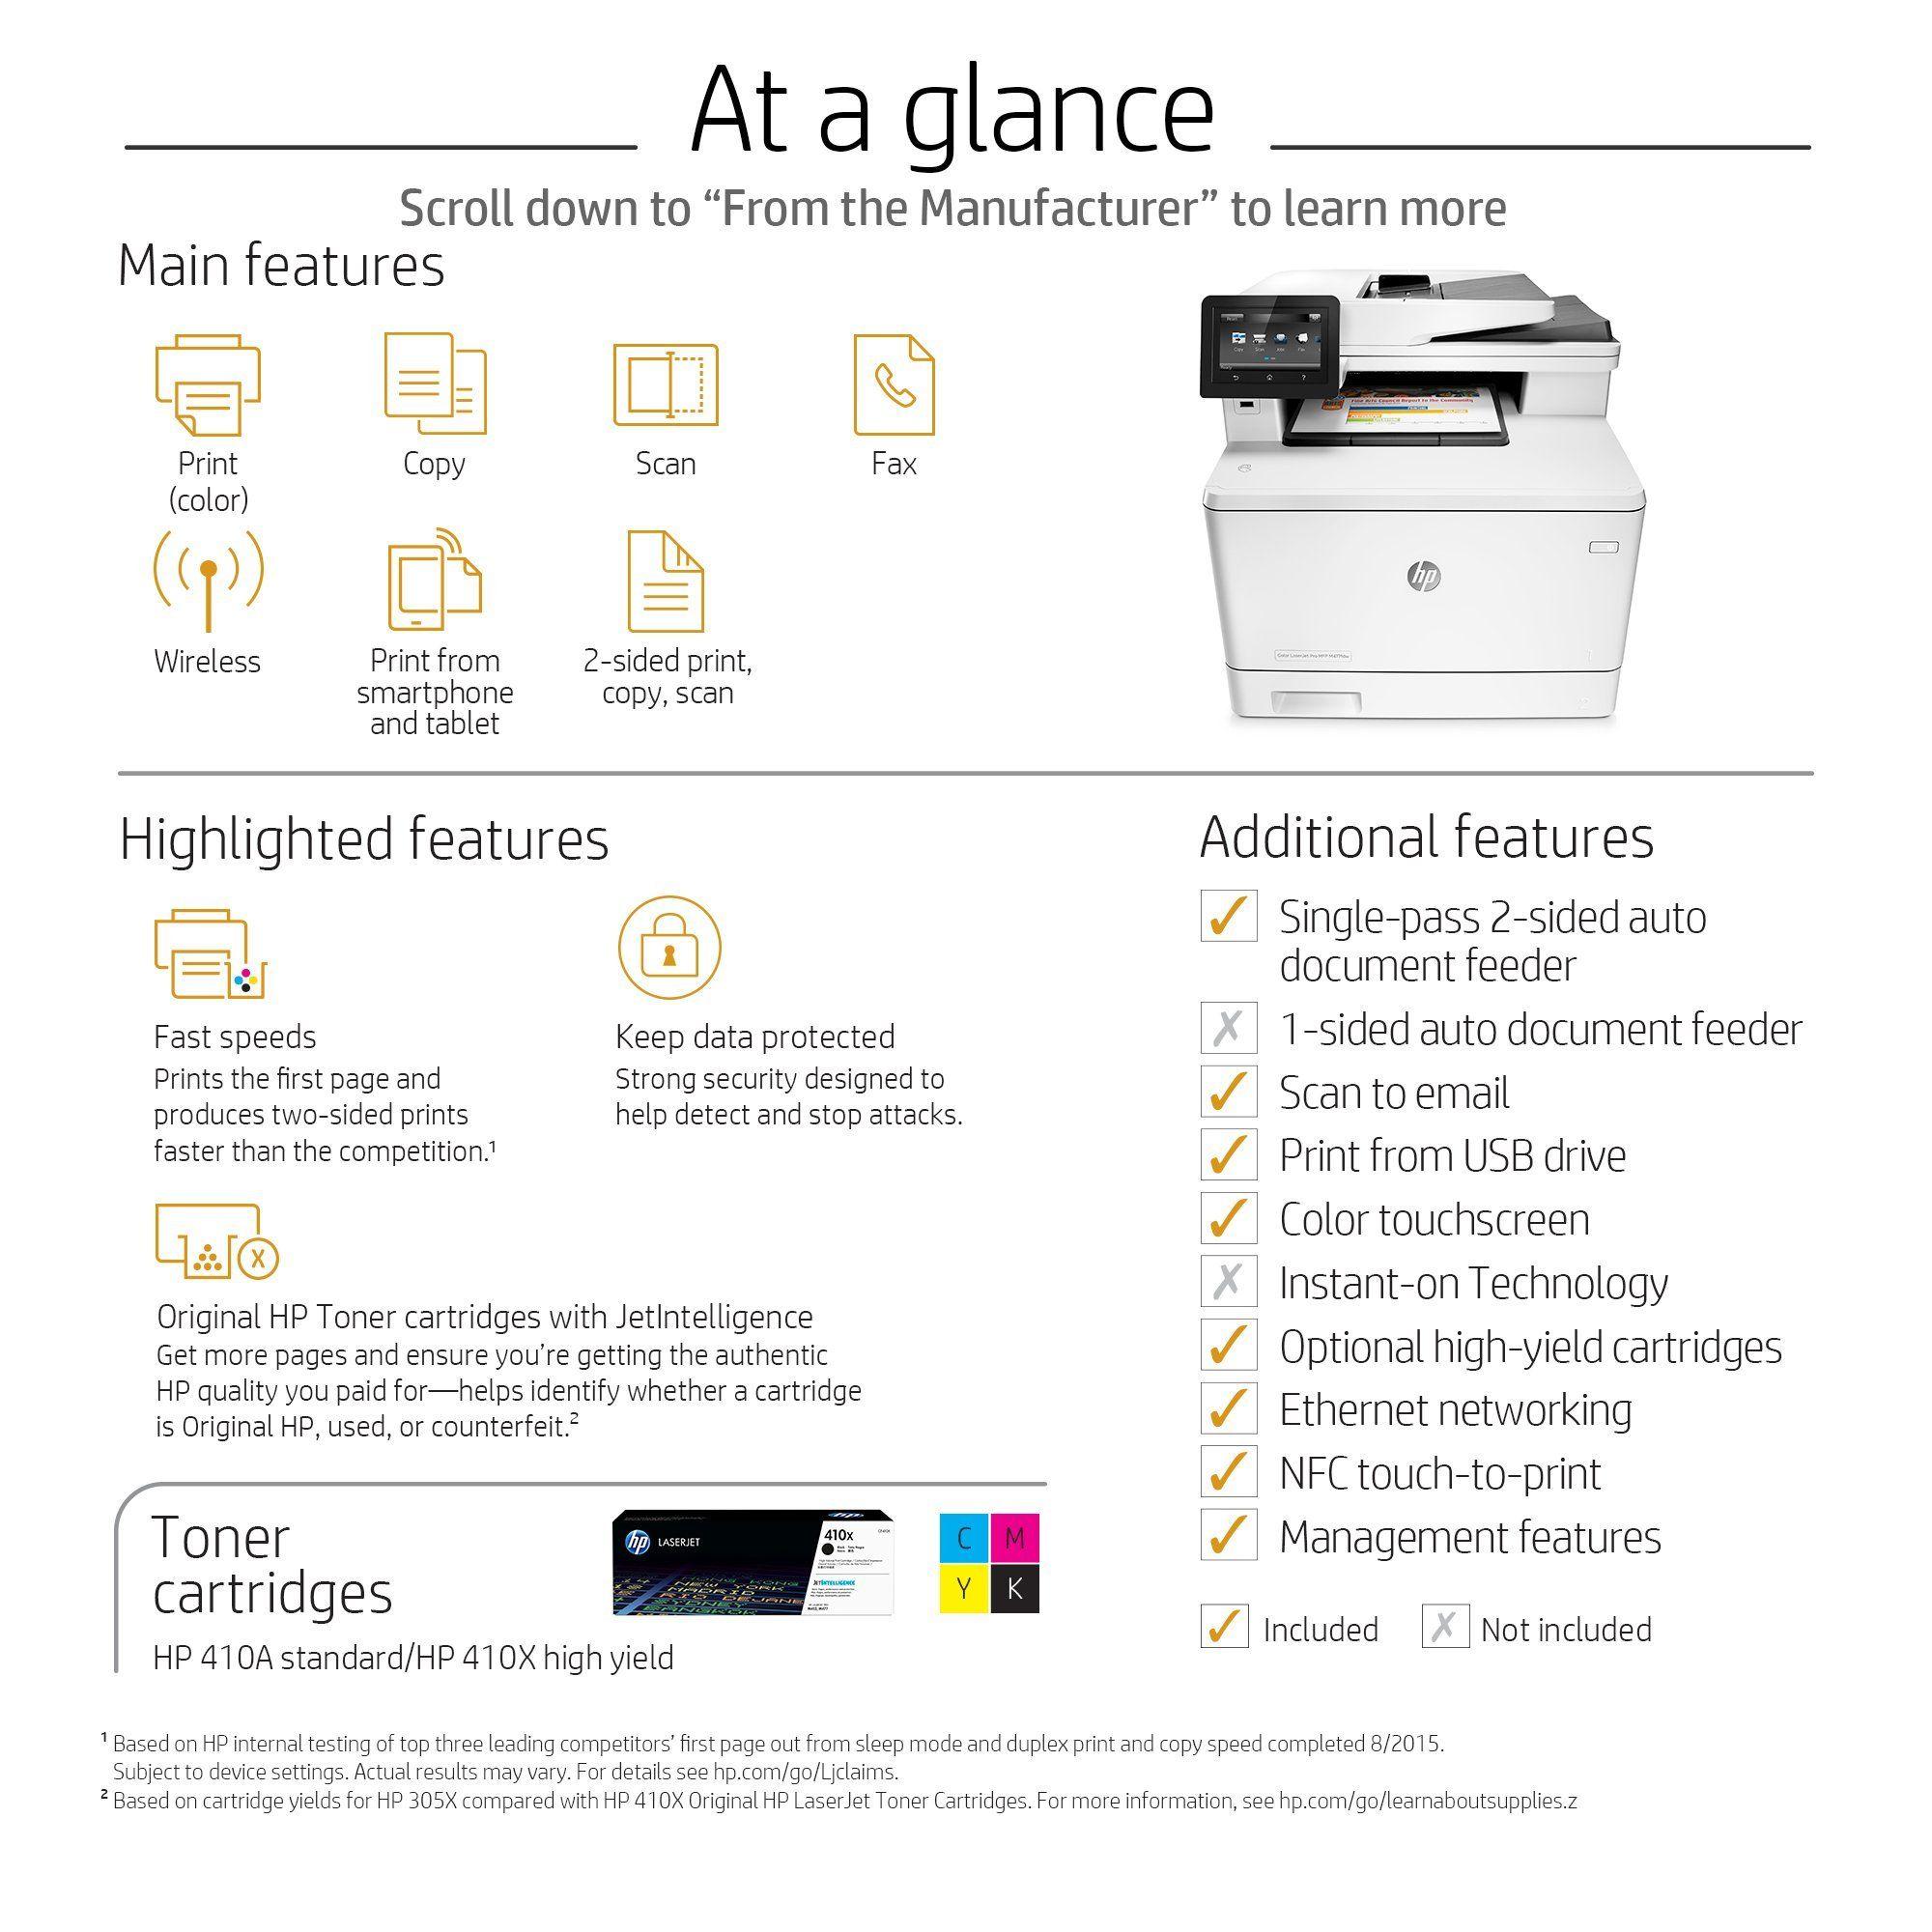 Hp Laserjet Pro M477fdw Multifunction Wireless Color Laser Printer With Duplex Printing Cf379a Certified Refurbished Click On Laser Printer Printer Wireless